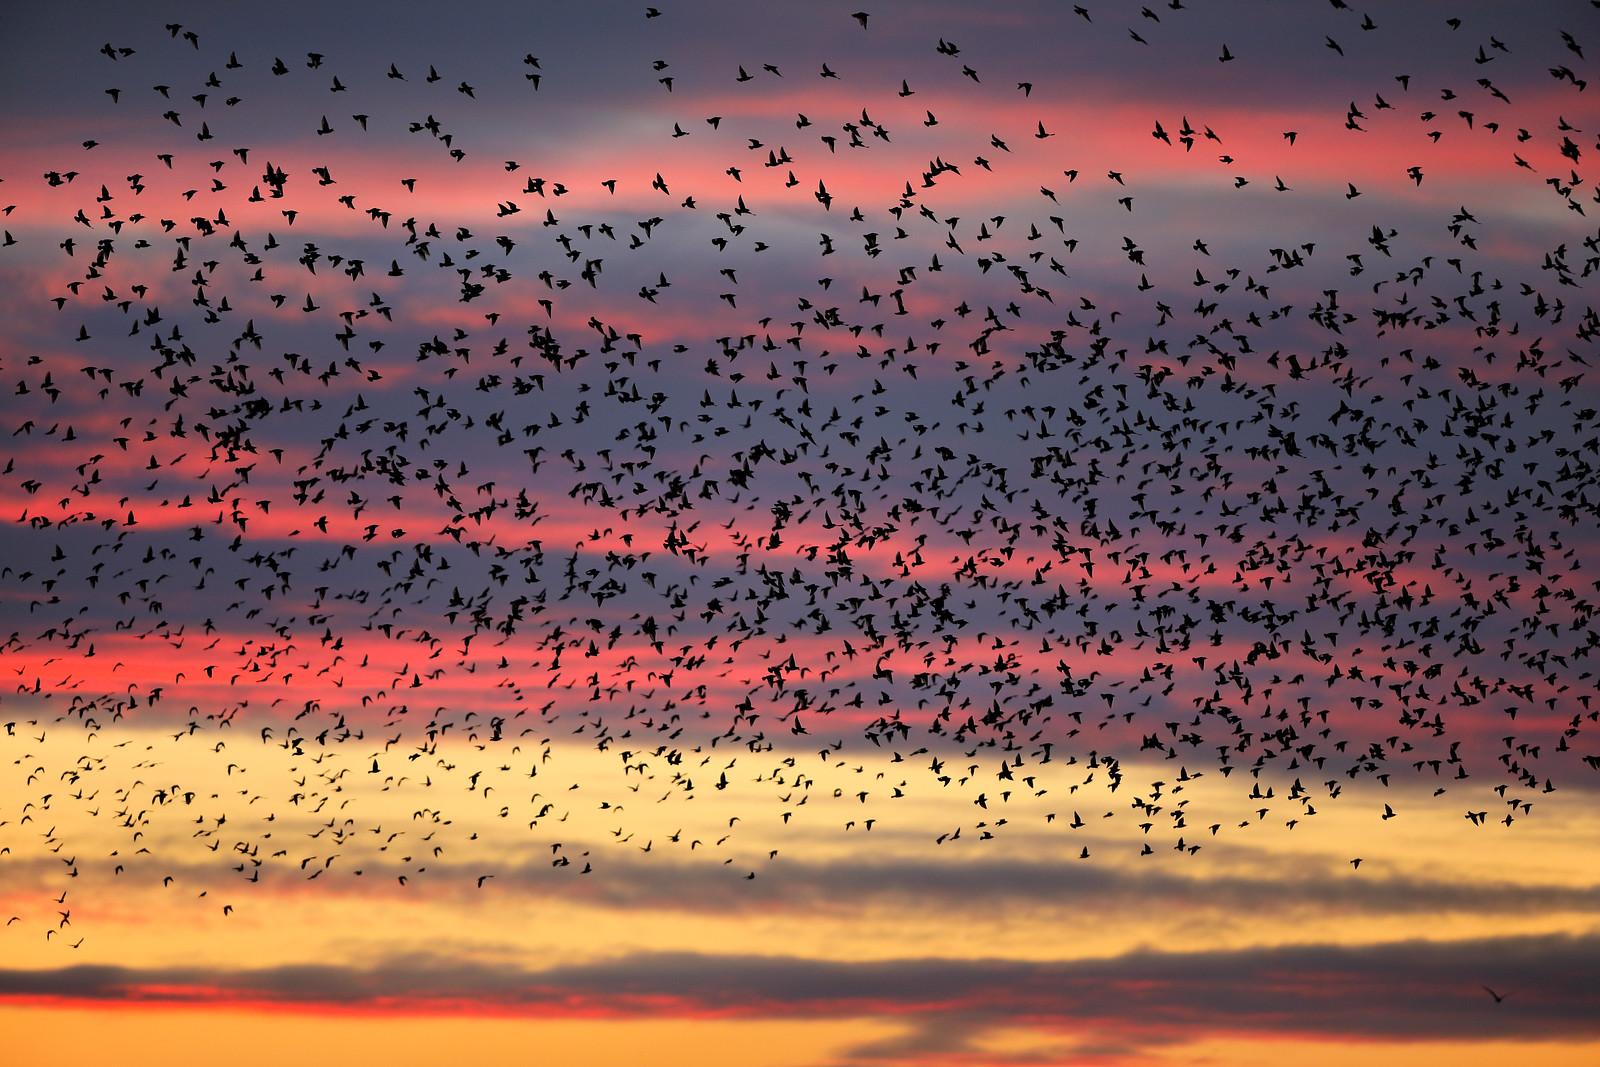 Starling Murmuration at Sunset - Brighton 2020